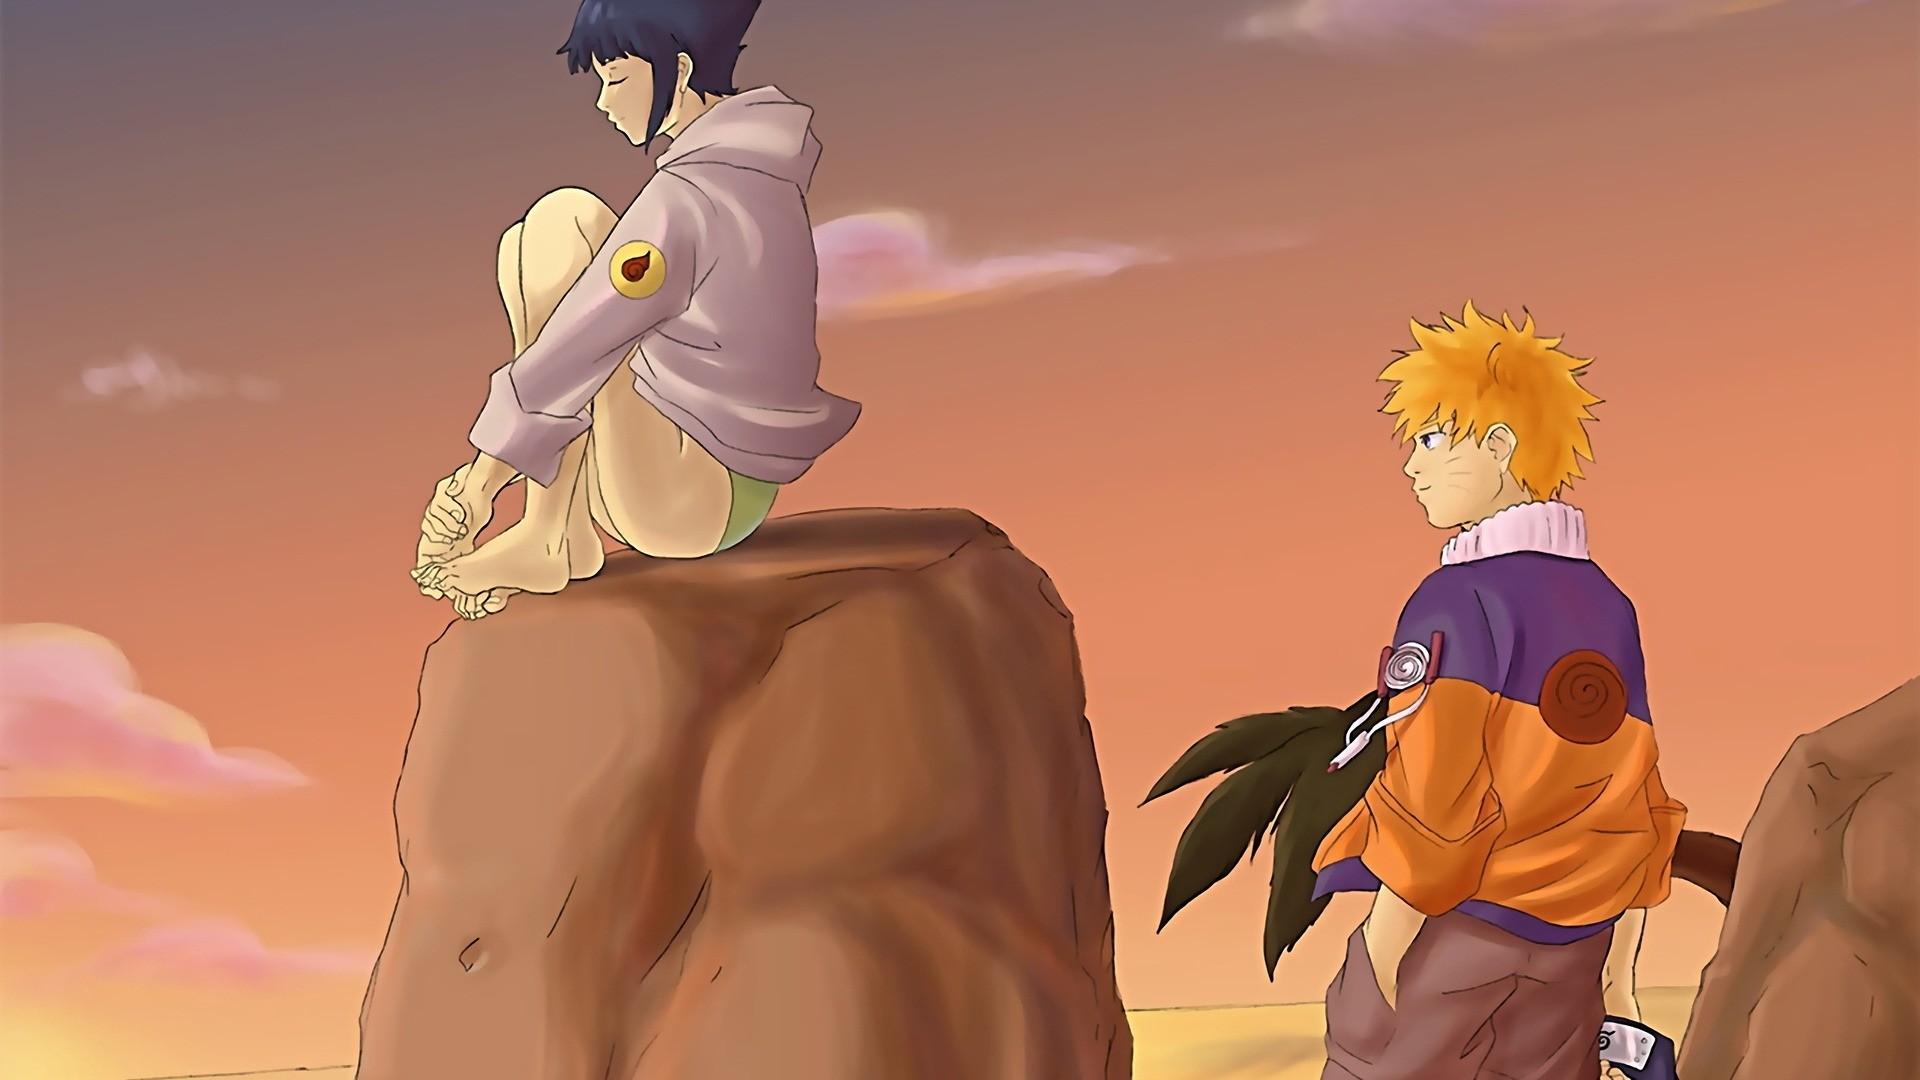 Wallpaper Naruto y Hinata